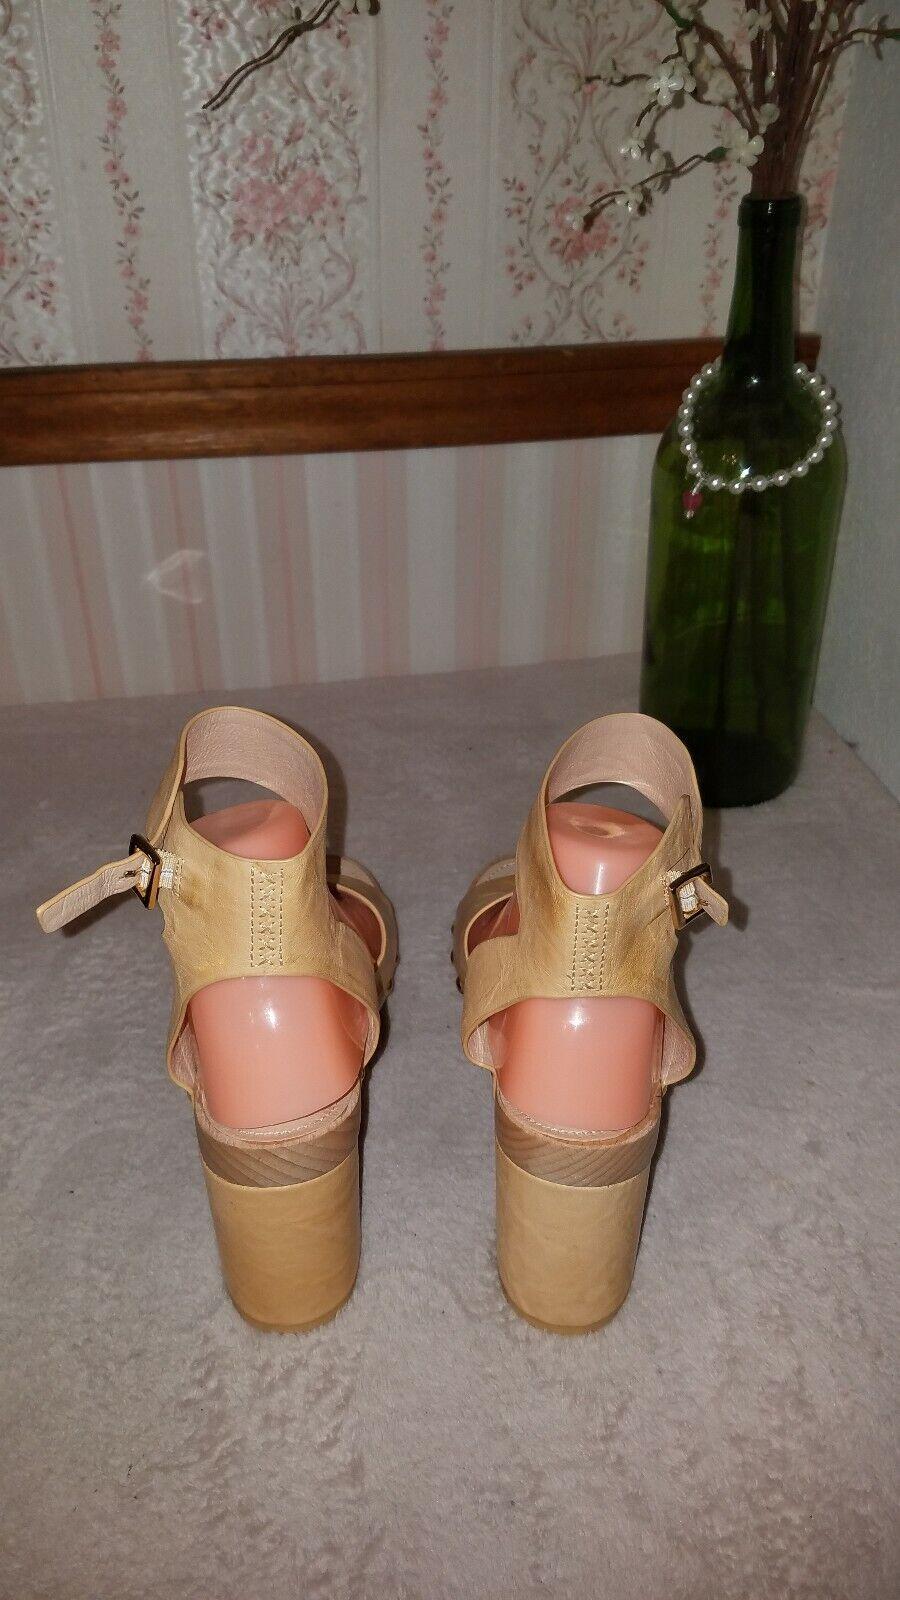 KELSI KELSI KELSI DAGGER BROOKLYN  Farris Platform Sandal in Marioro Leather Dimensione 7.5 ed2678